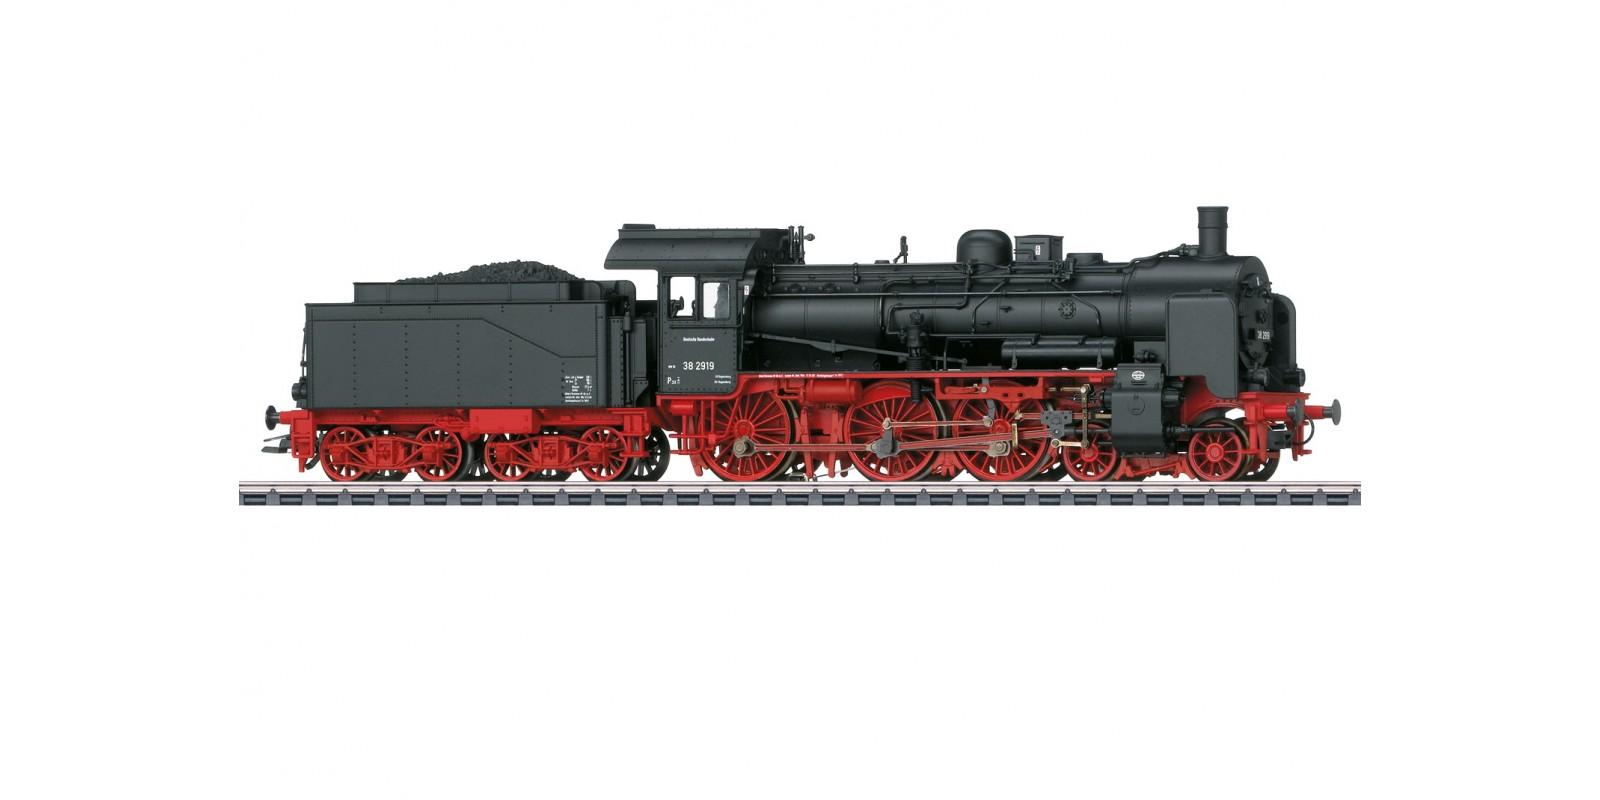 39380 Class 38 Steam Locomotive